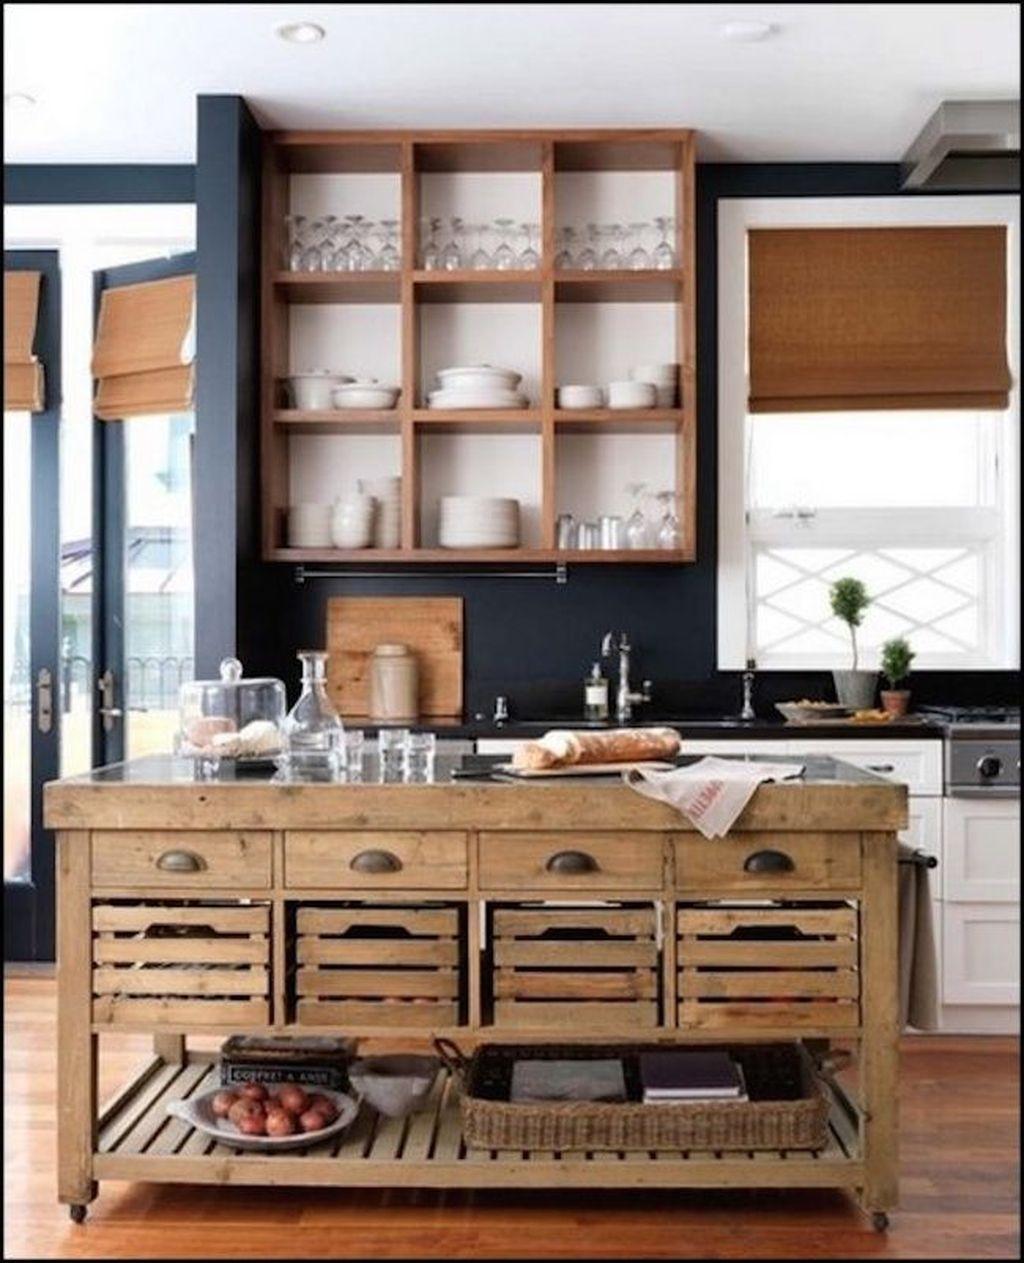 28 Small Kitchen Design Ideas: Awesome Rustic Kitchen Island Design Ideas 28